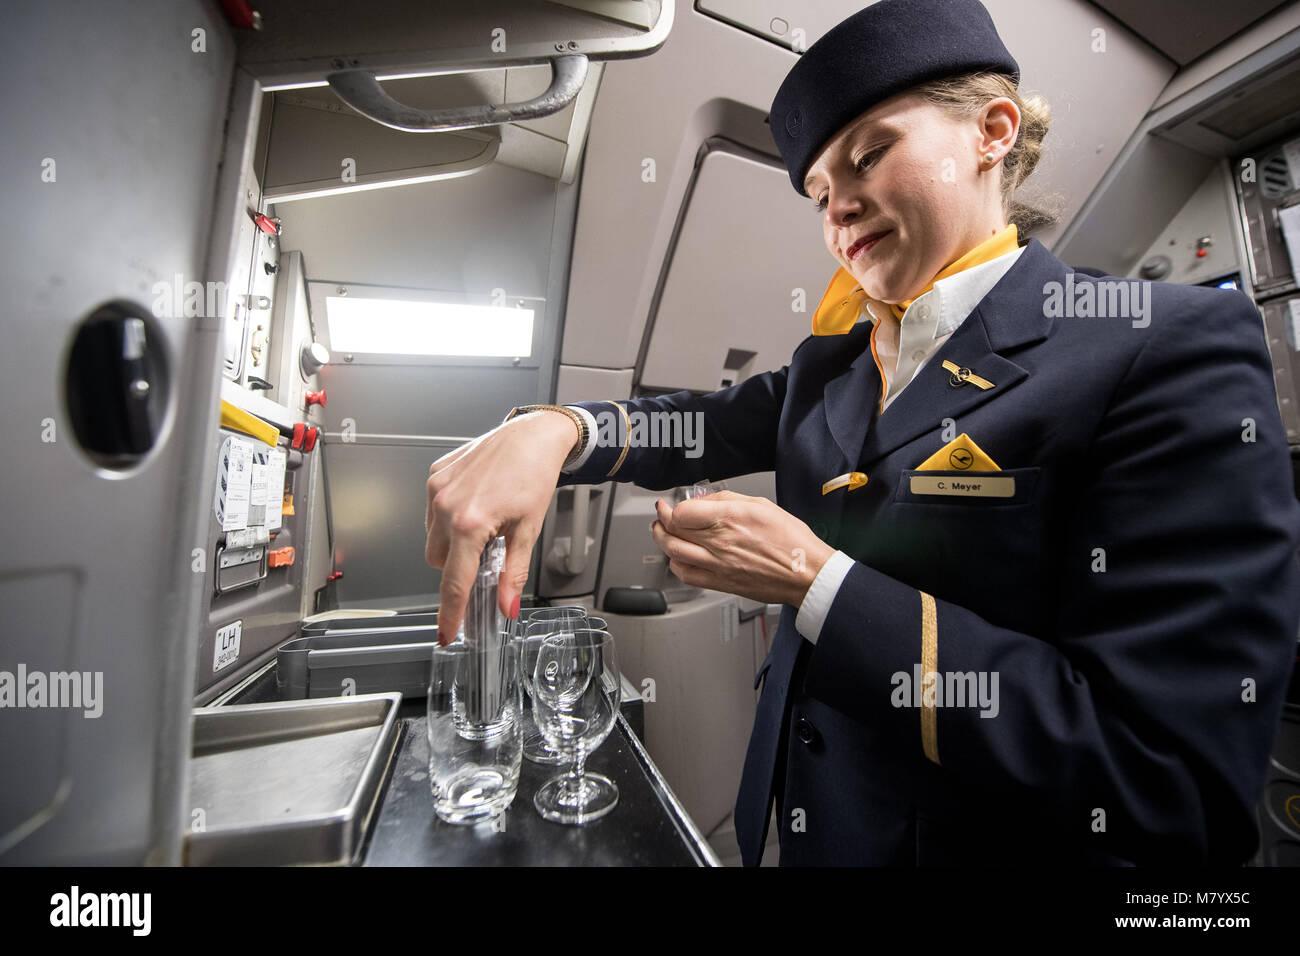 08 March 2018, Germany, Frankfurt: Lufthansa flight attendant Mrs Meyer prepares glasses with drinks for boarding - Stock Image